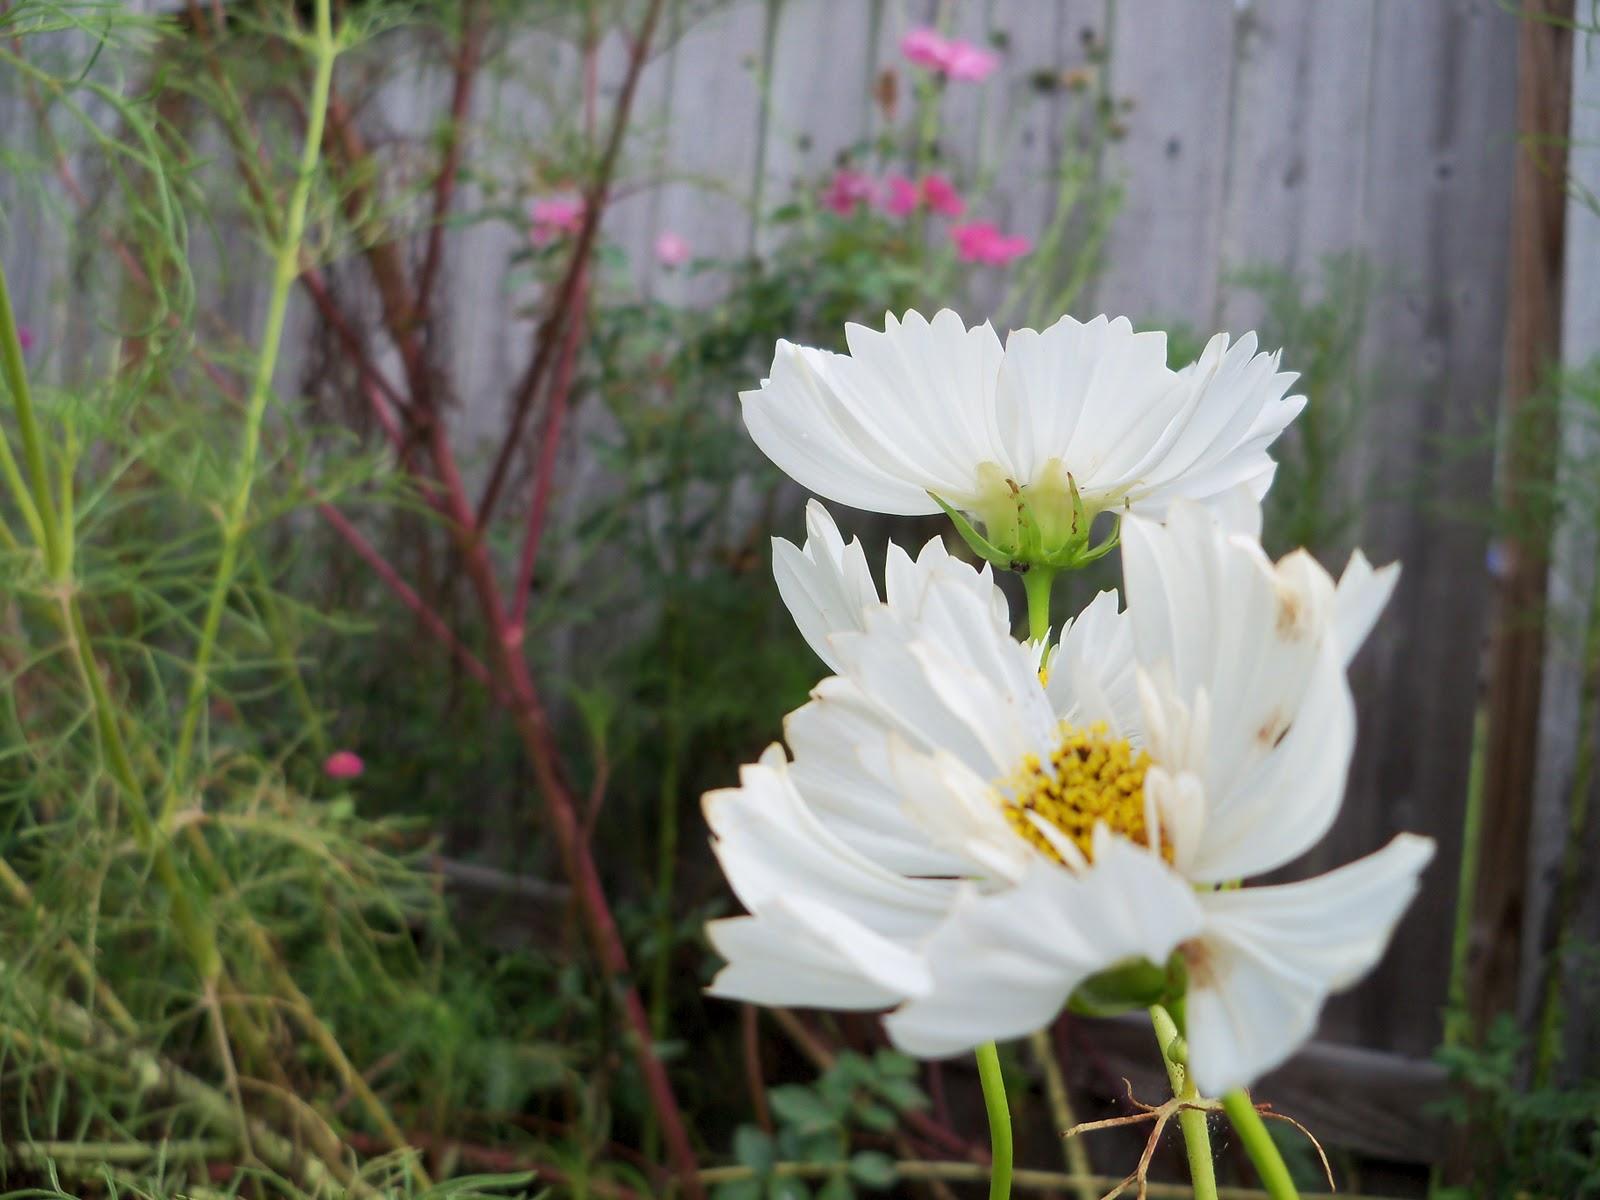 Gardening 2010, Part Three - 101_5171.JPG